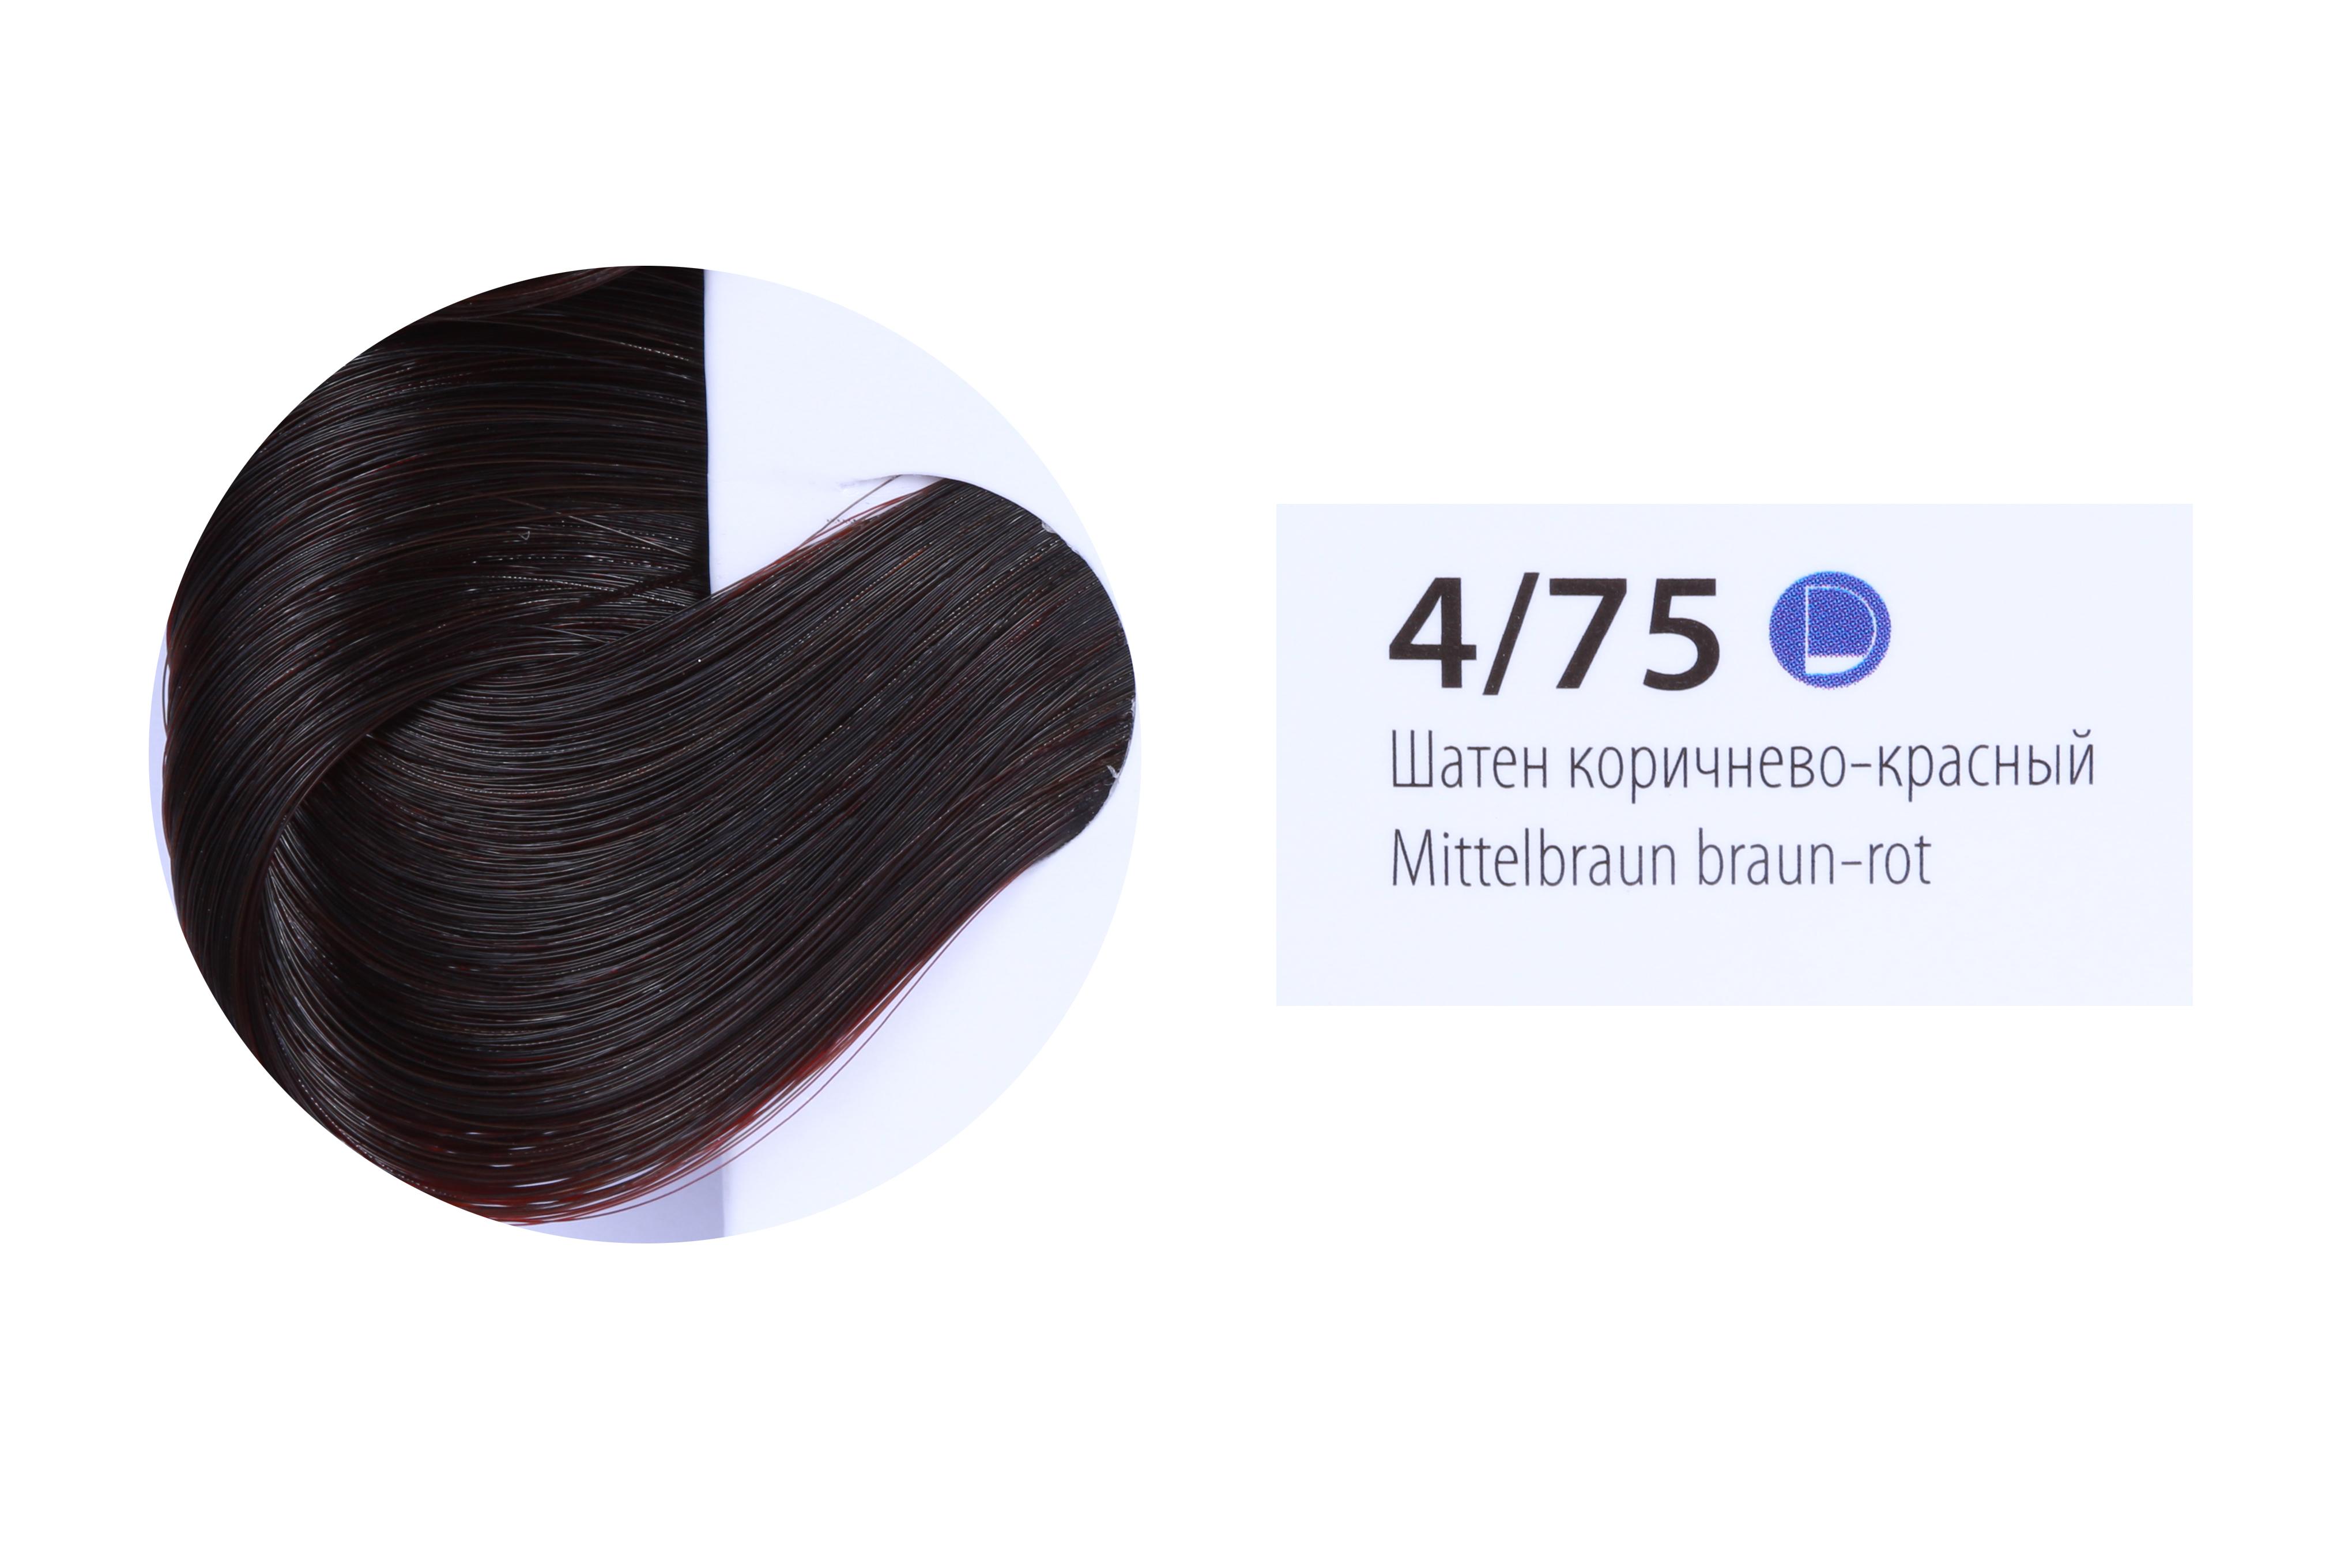 ESTEL PROFESSIONAL 4/75 краска д/волос / DE LUXE 60мл